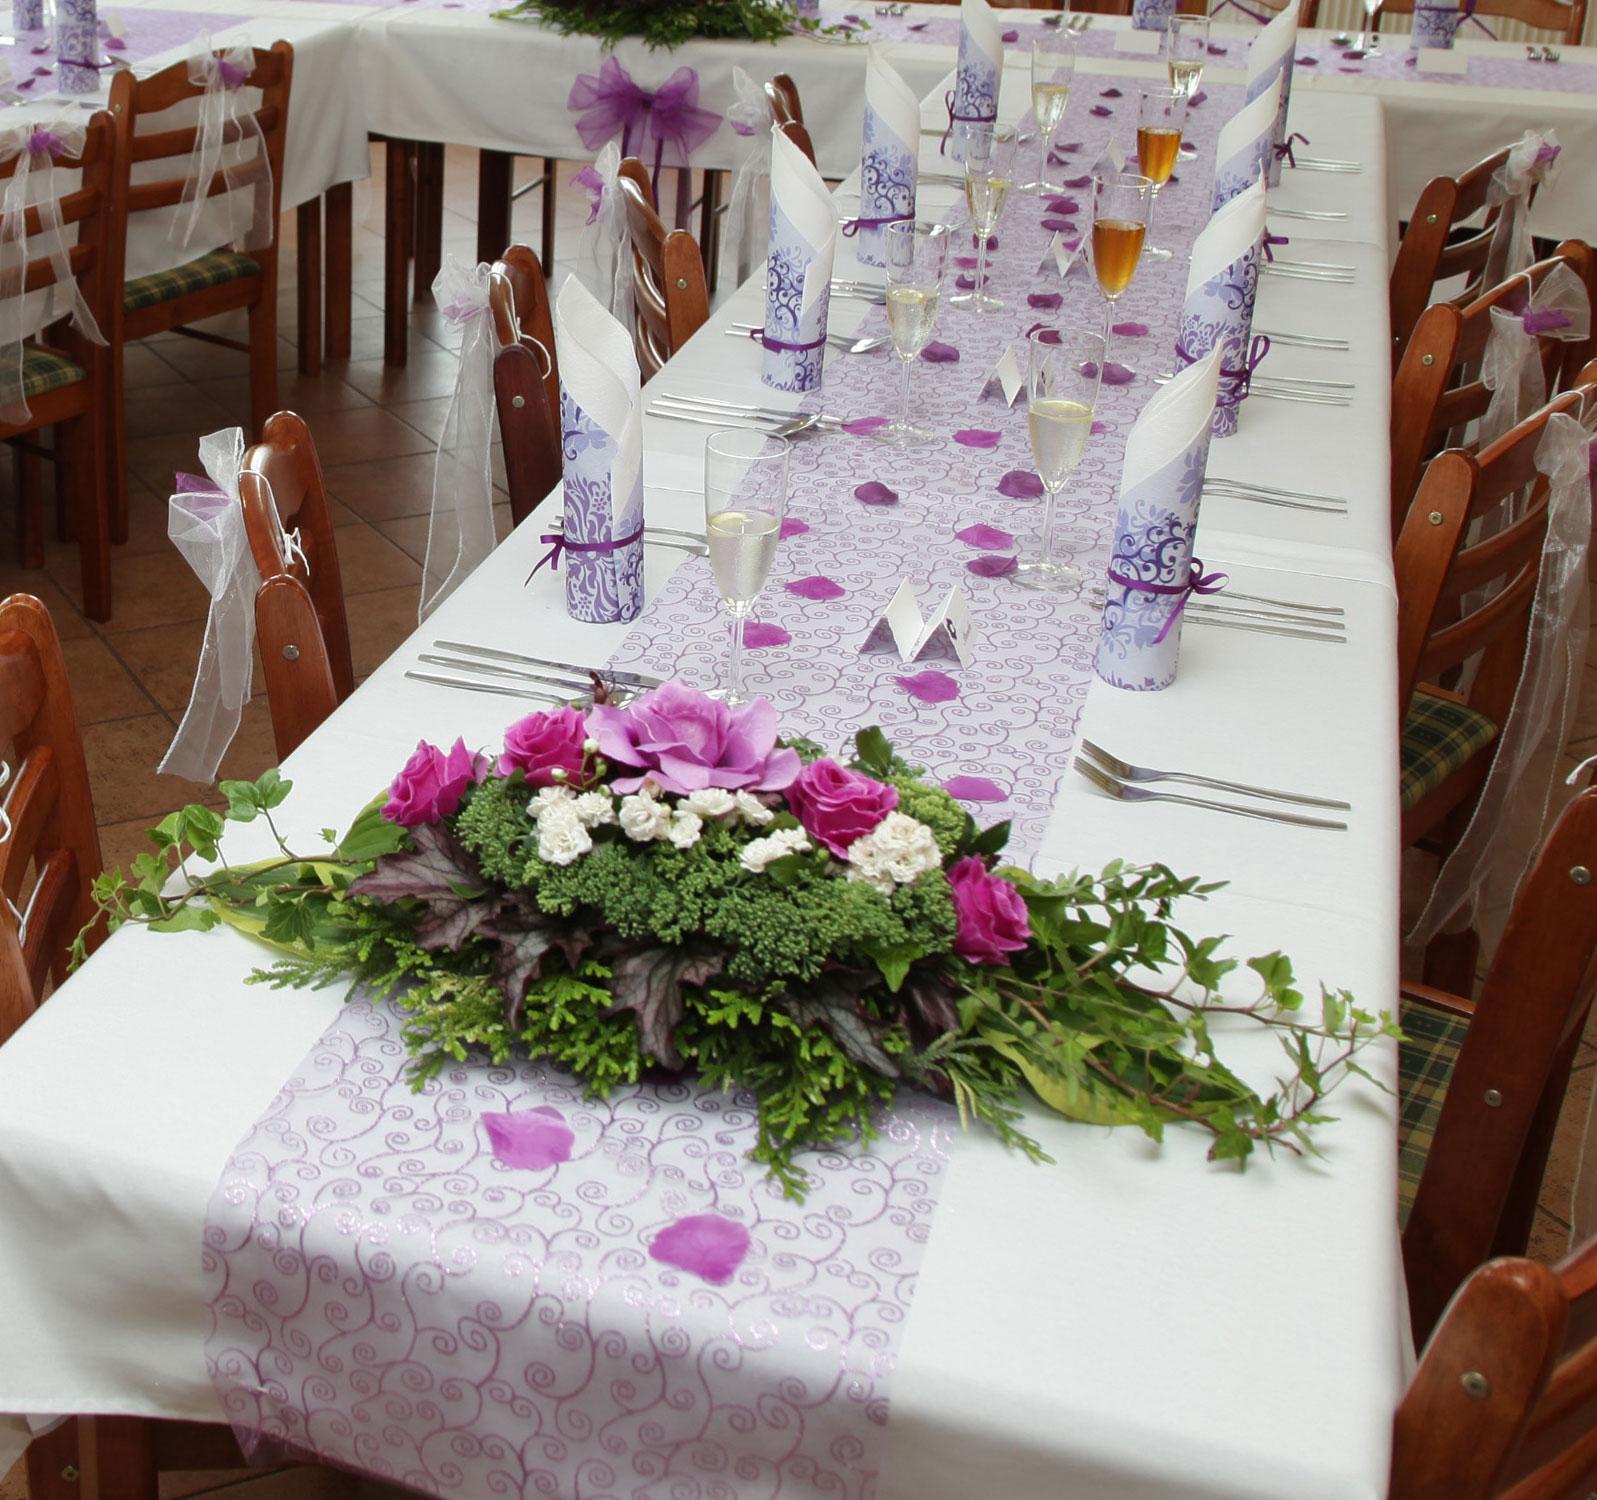 Fialova Svatebni Dekorace 1 200 Kc Svatebni Bazar Beremese Cz